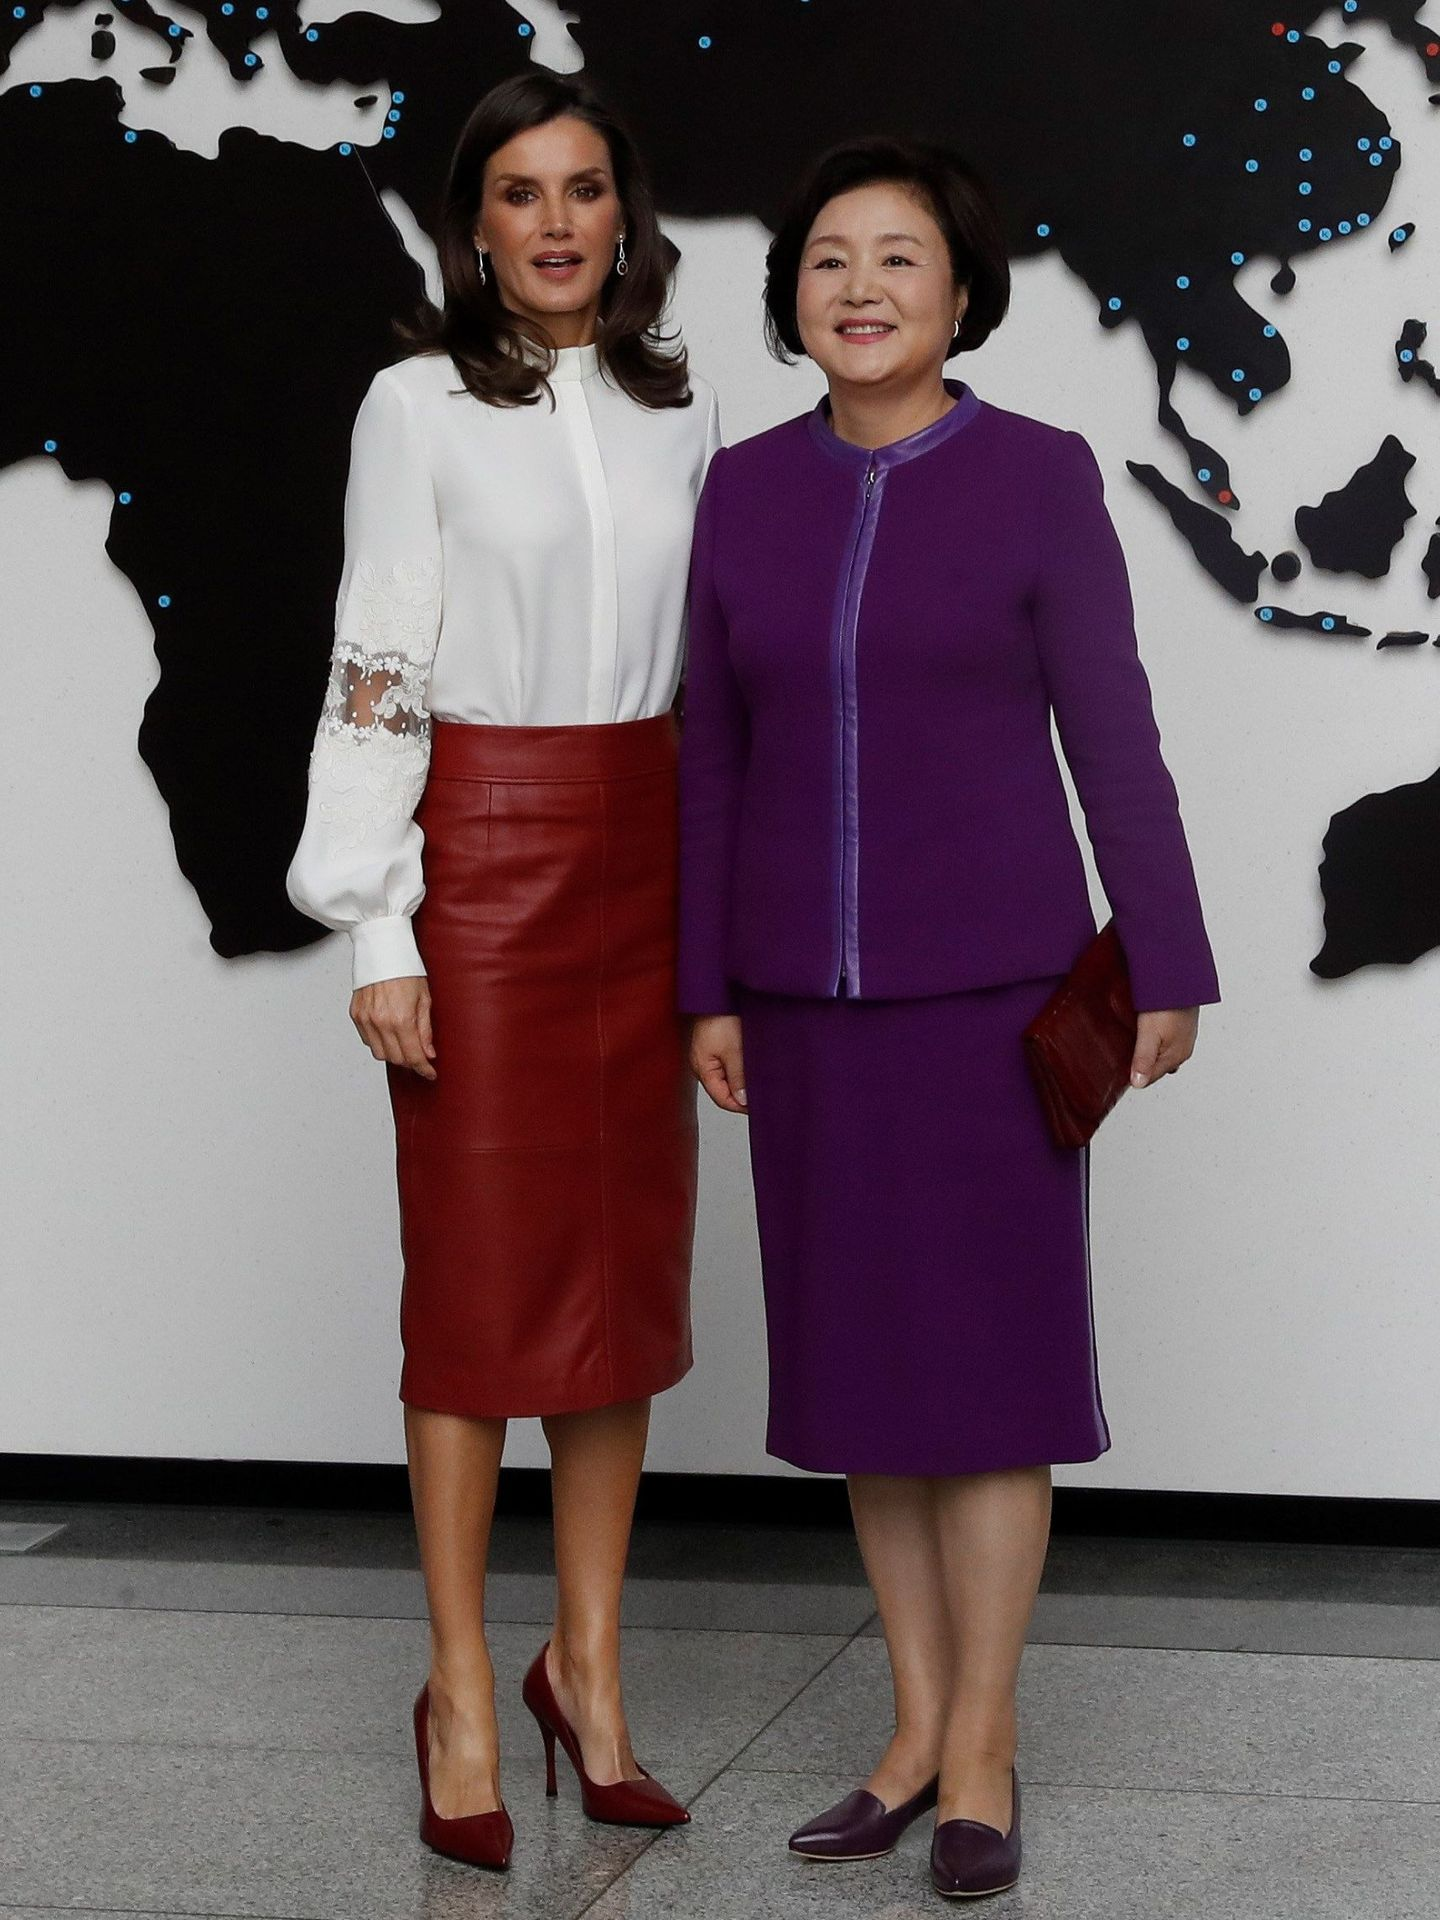 La Reina, en Corea con la misma falda. (Reuters)